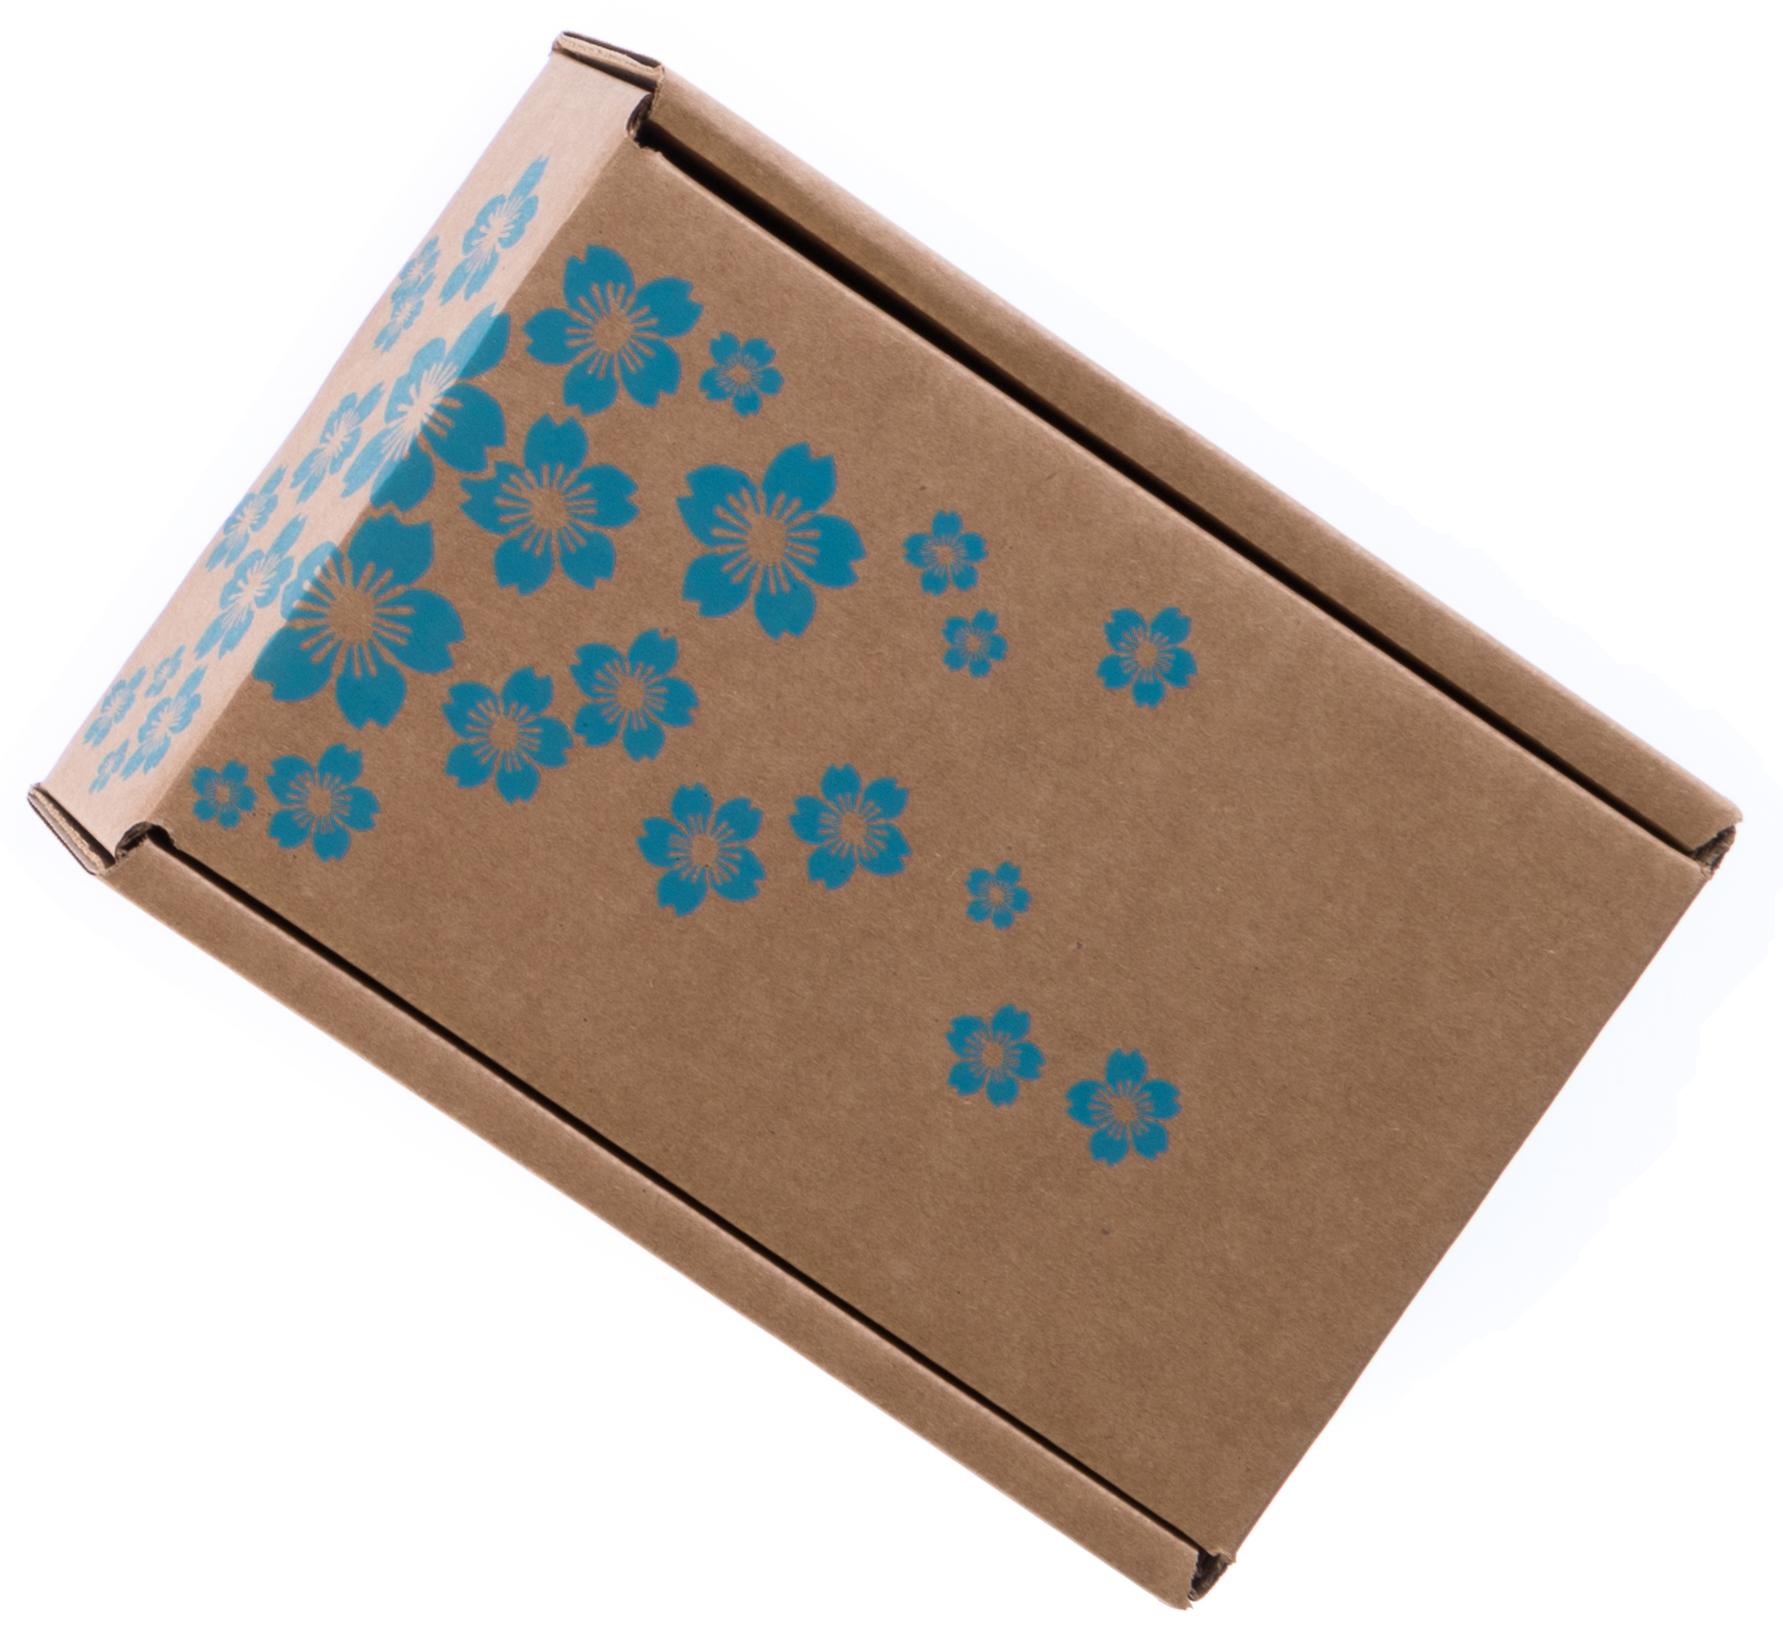 Yuzen subscription box